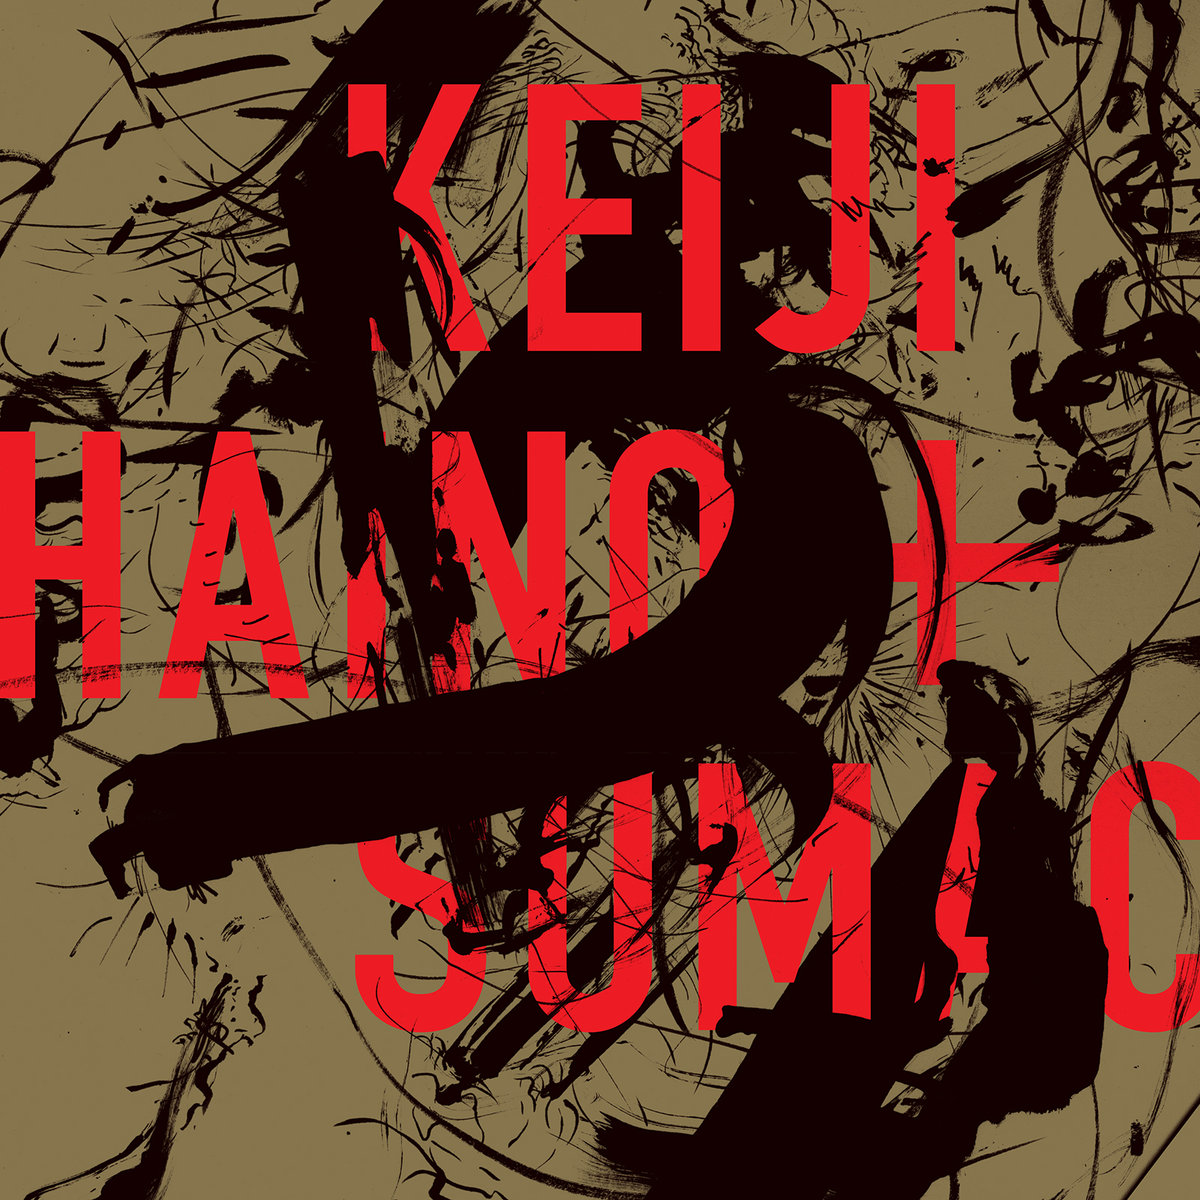 Keiji Haino Sumac American Dollar Bill review